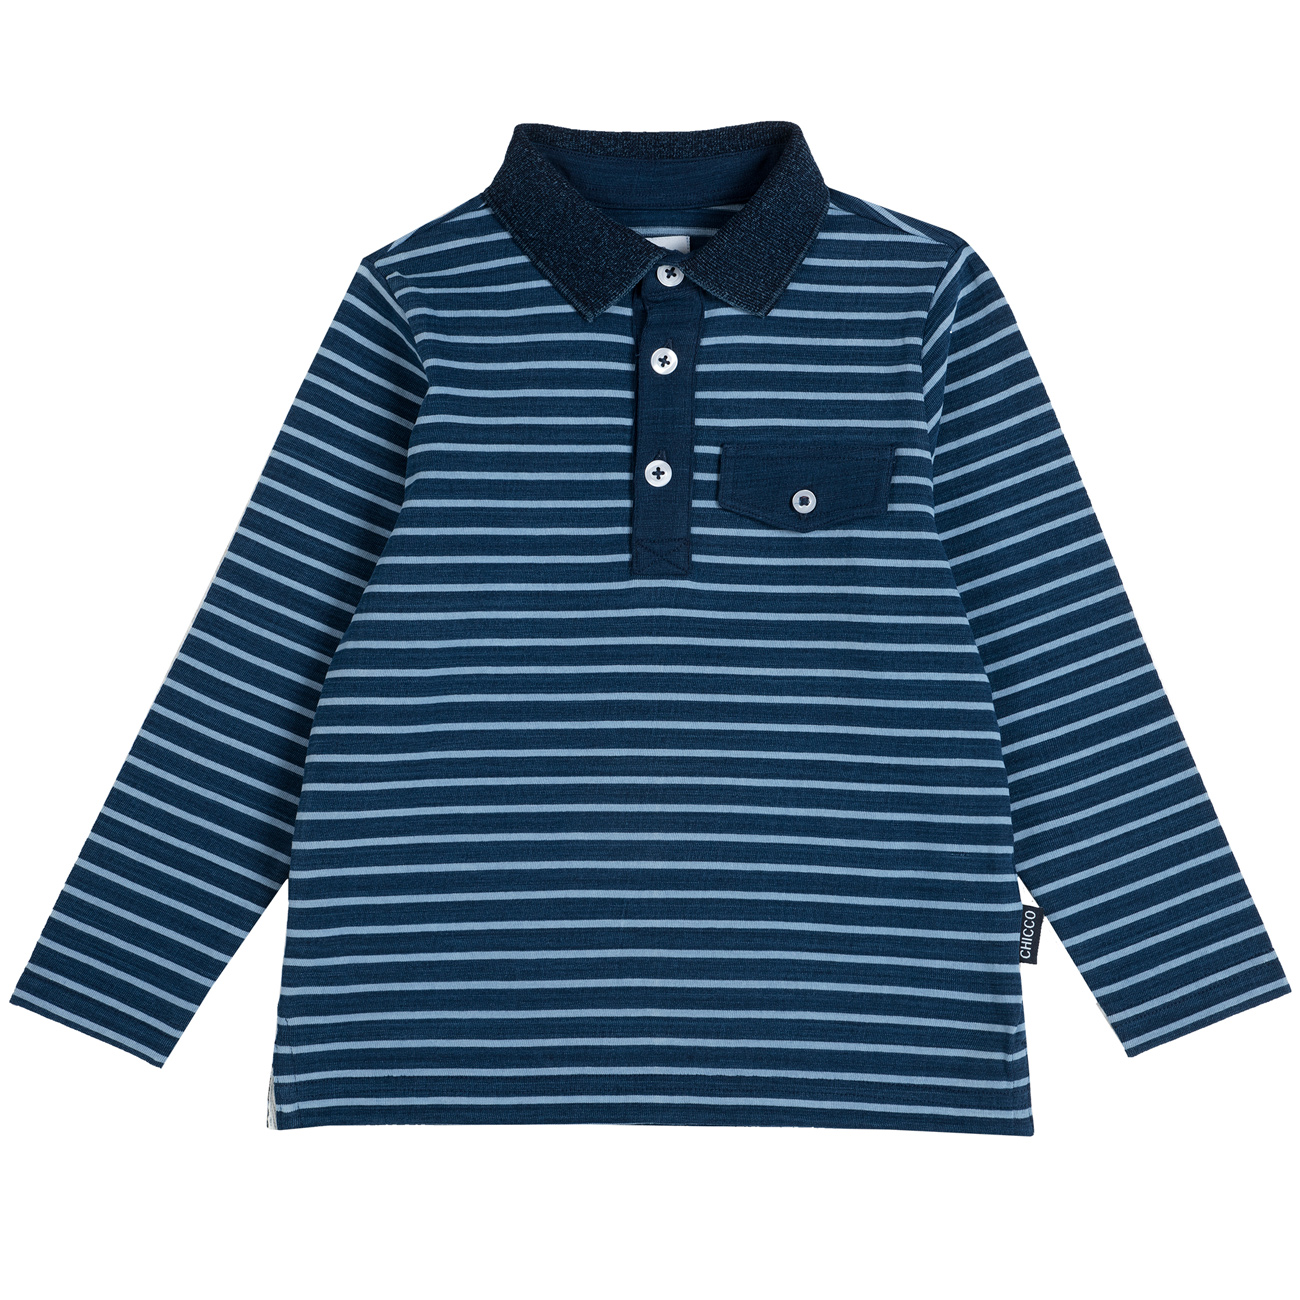 Tricou Copii Chicco, Albastru